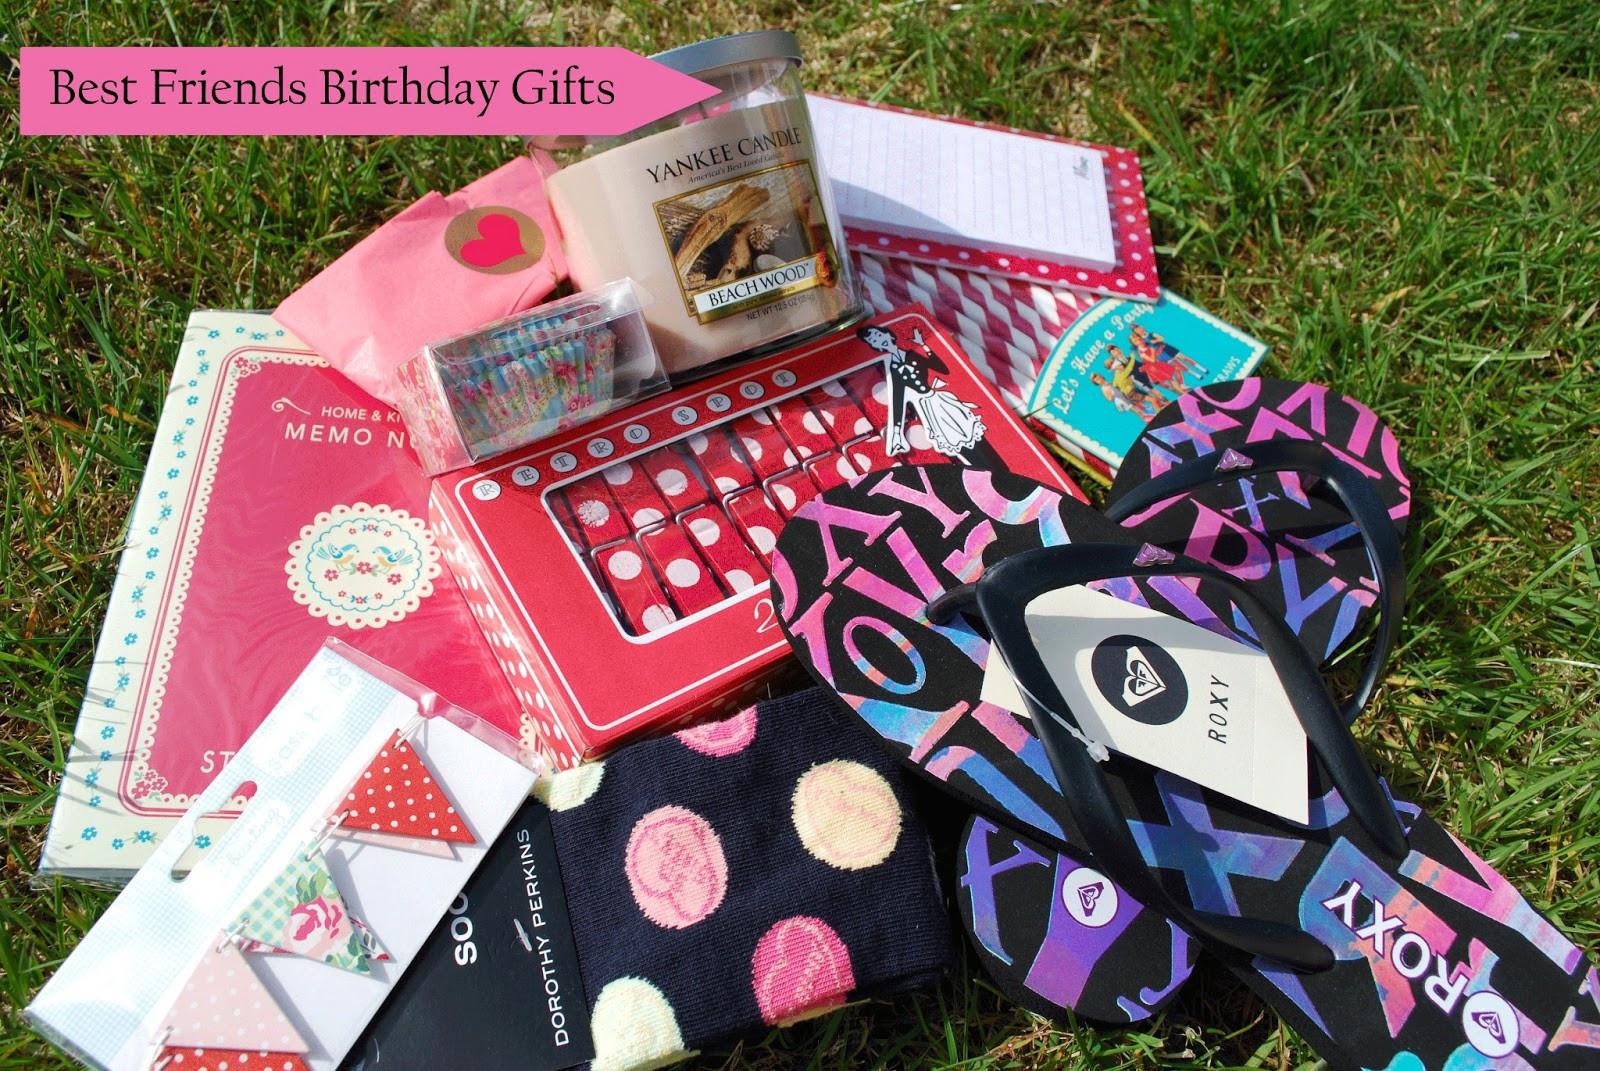 Best Friends Birthday Gifts  Heart Ocean Secrets Best Friends Birthday Gifts